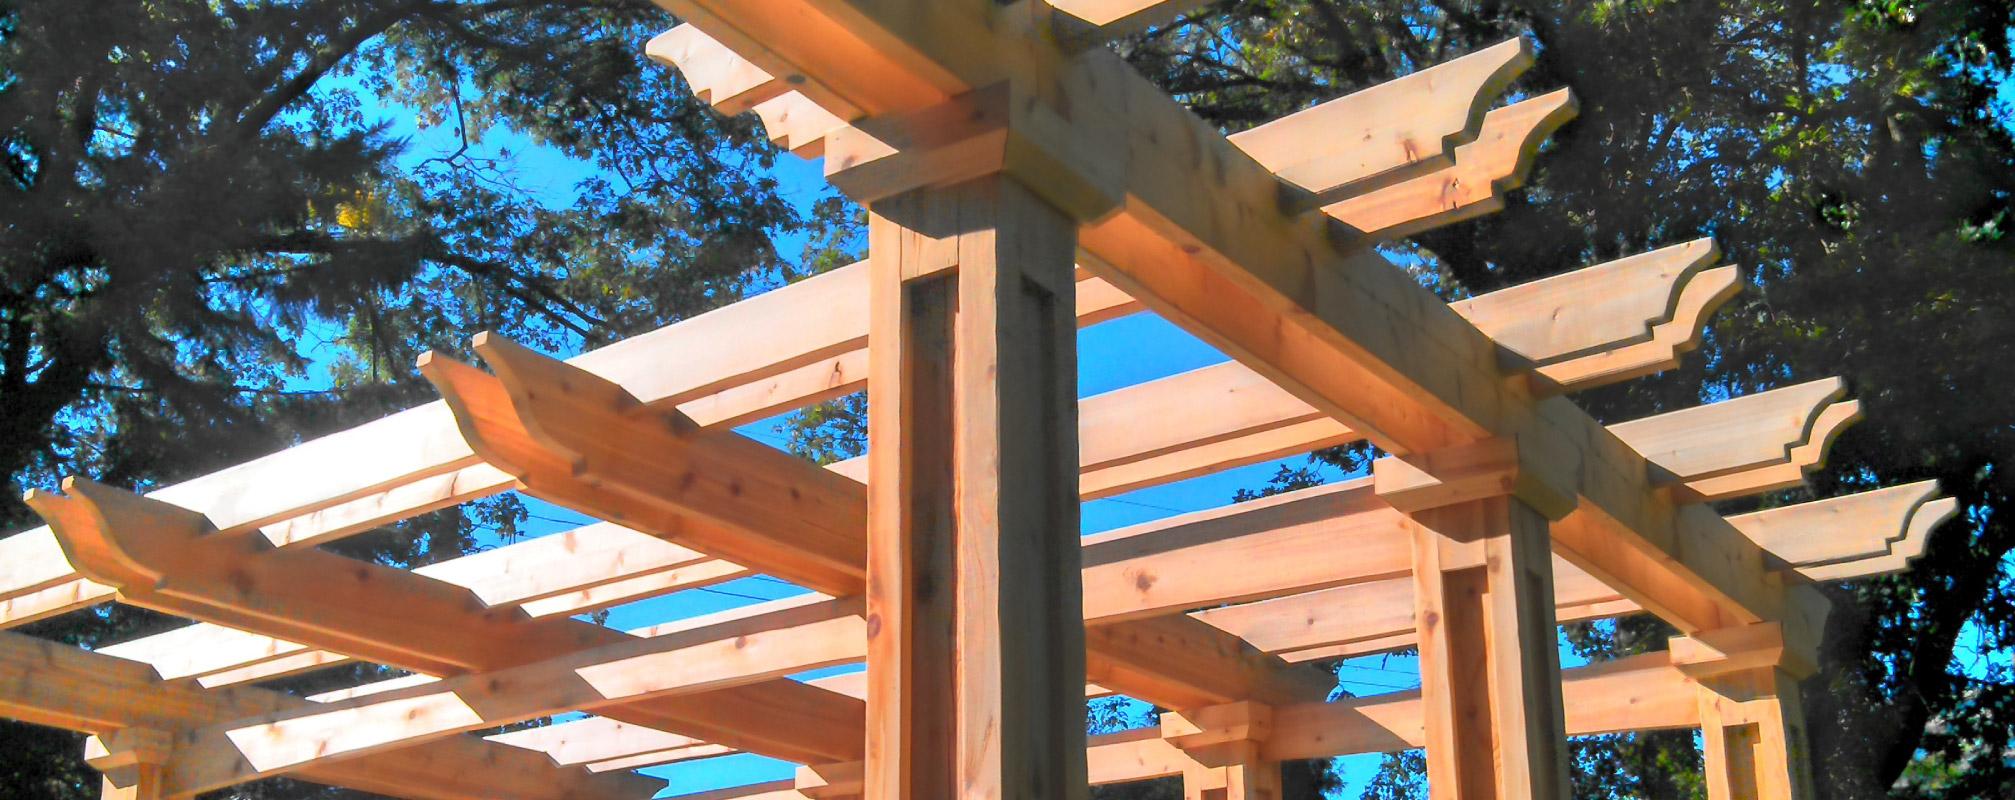 wooden gazebo in ottawa